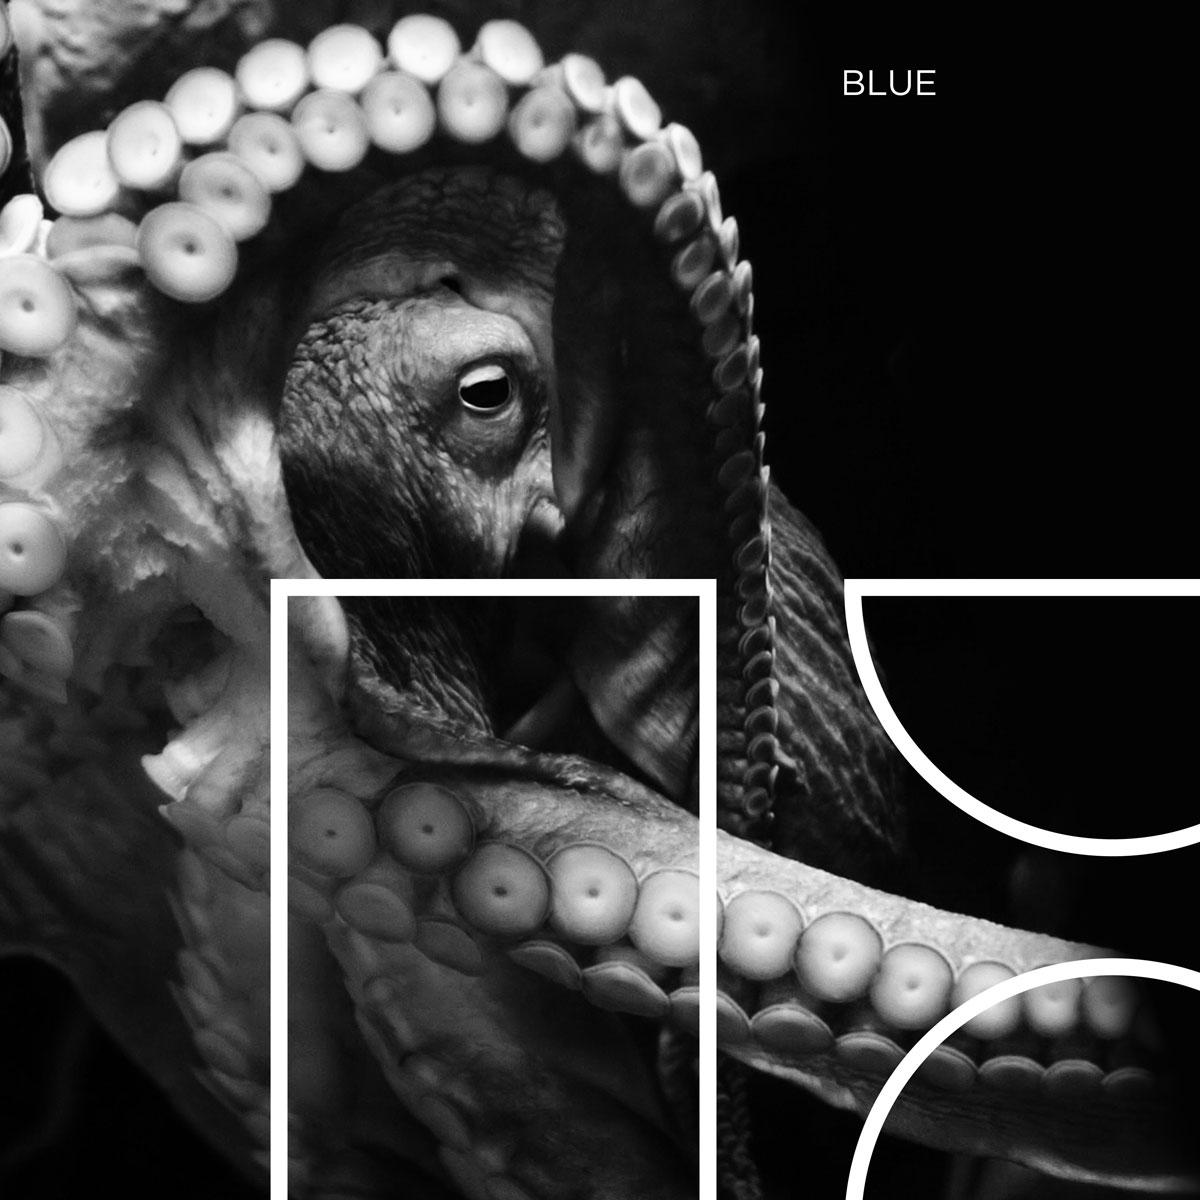 Mal Fantôme | On Fire - Available on Spotify, Apple Music, Deezer, YouTube, etc.